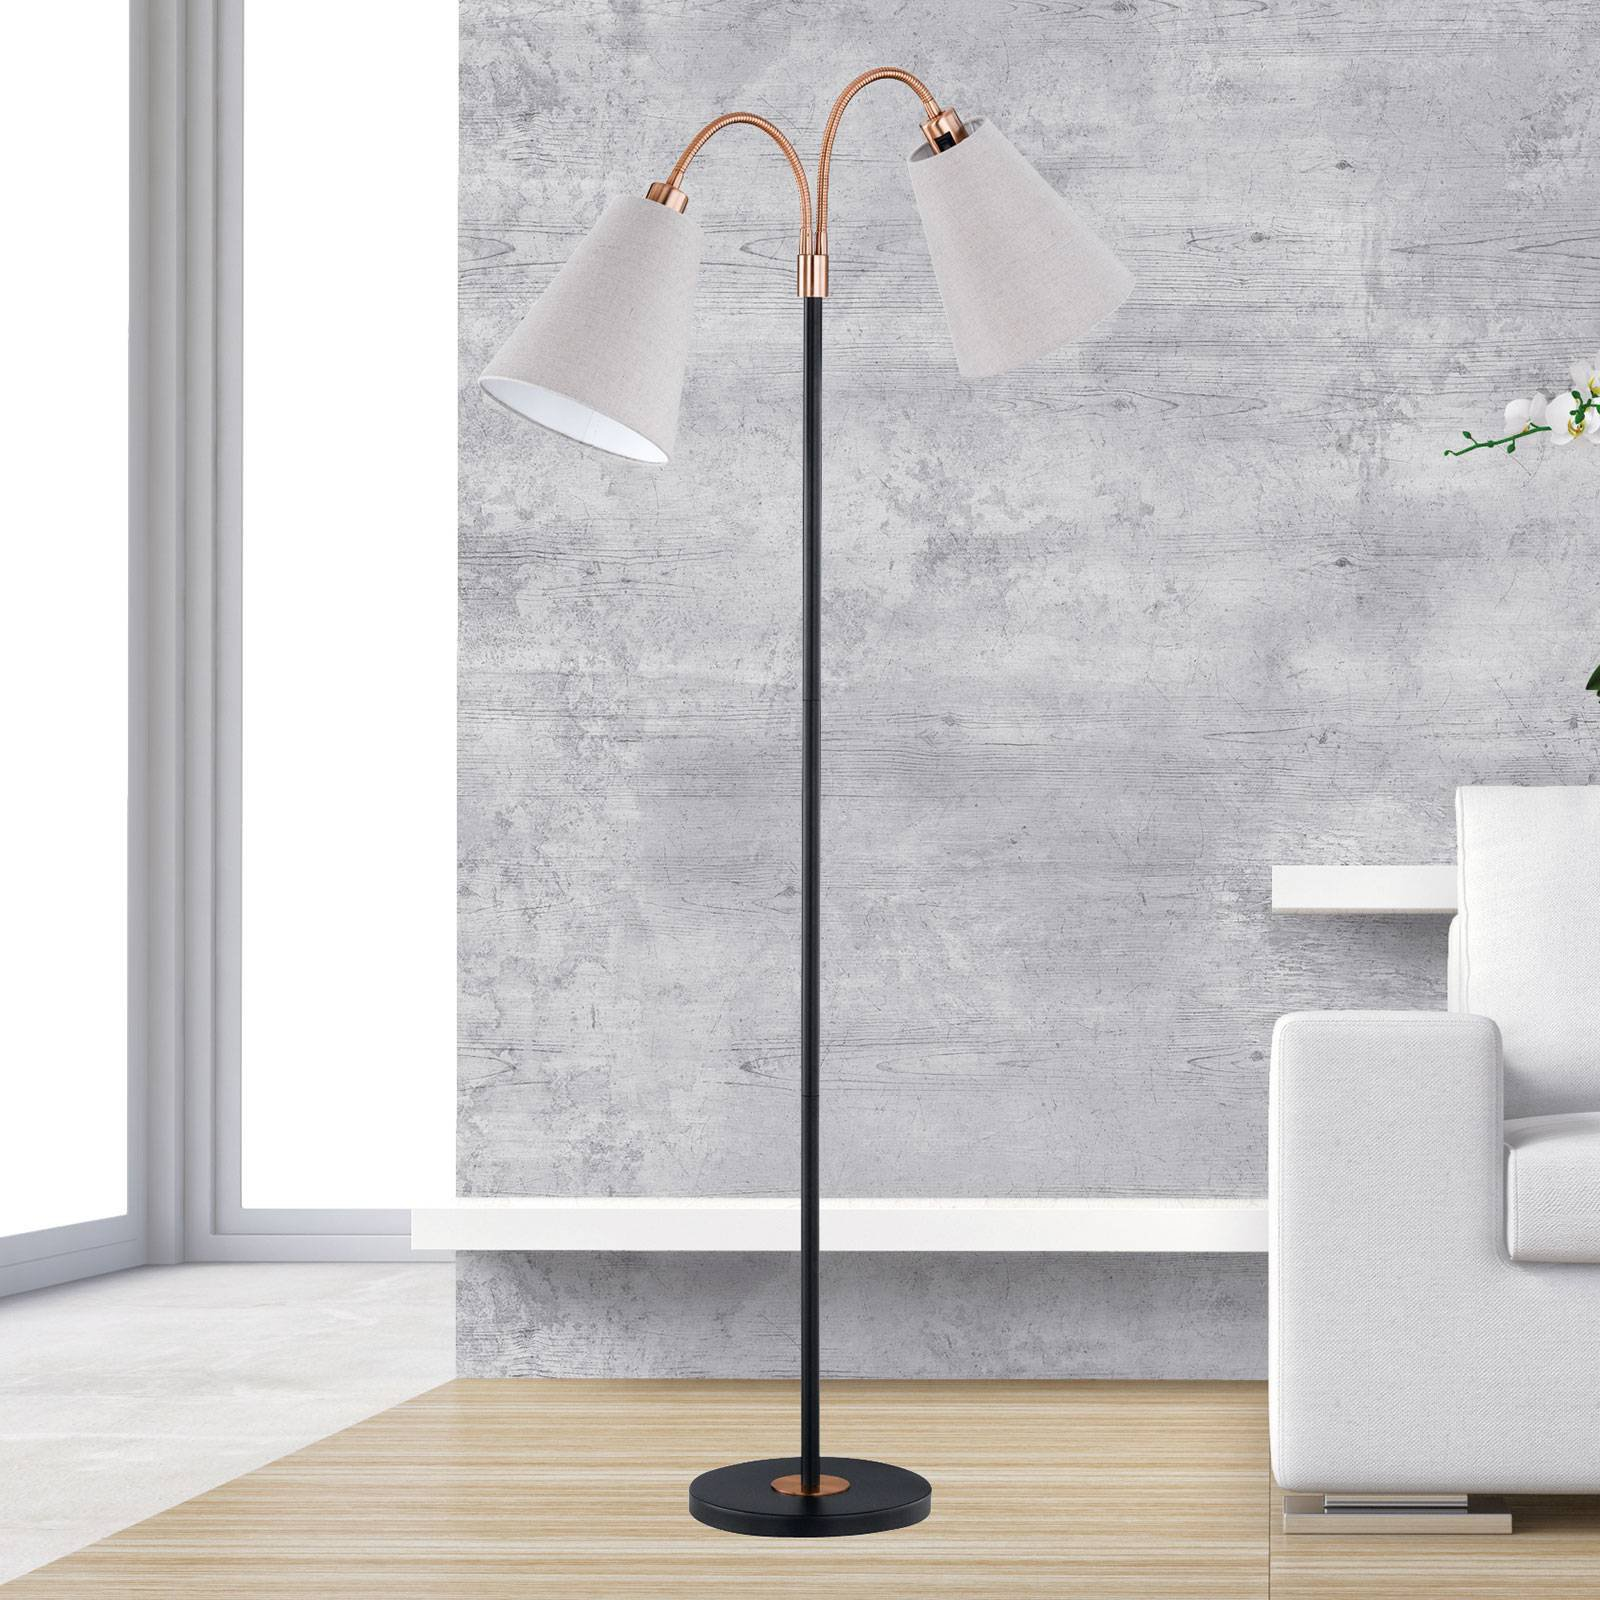 Topunkts stålampe Hopper svart-bronse